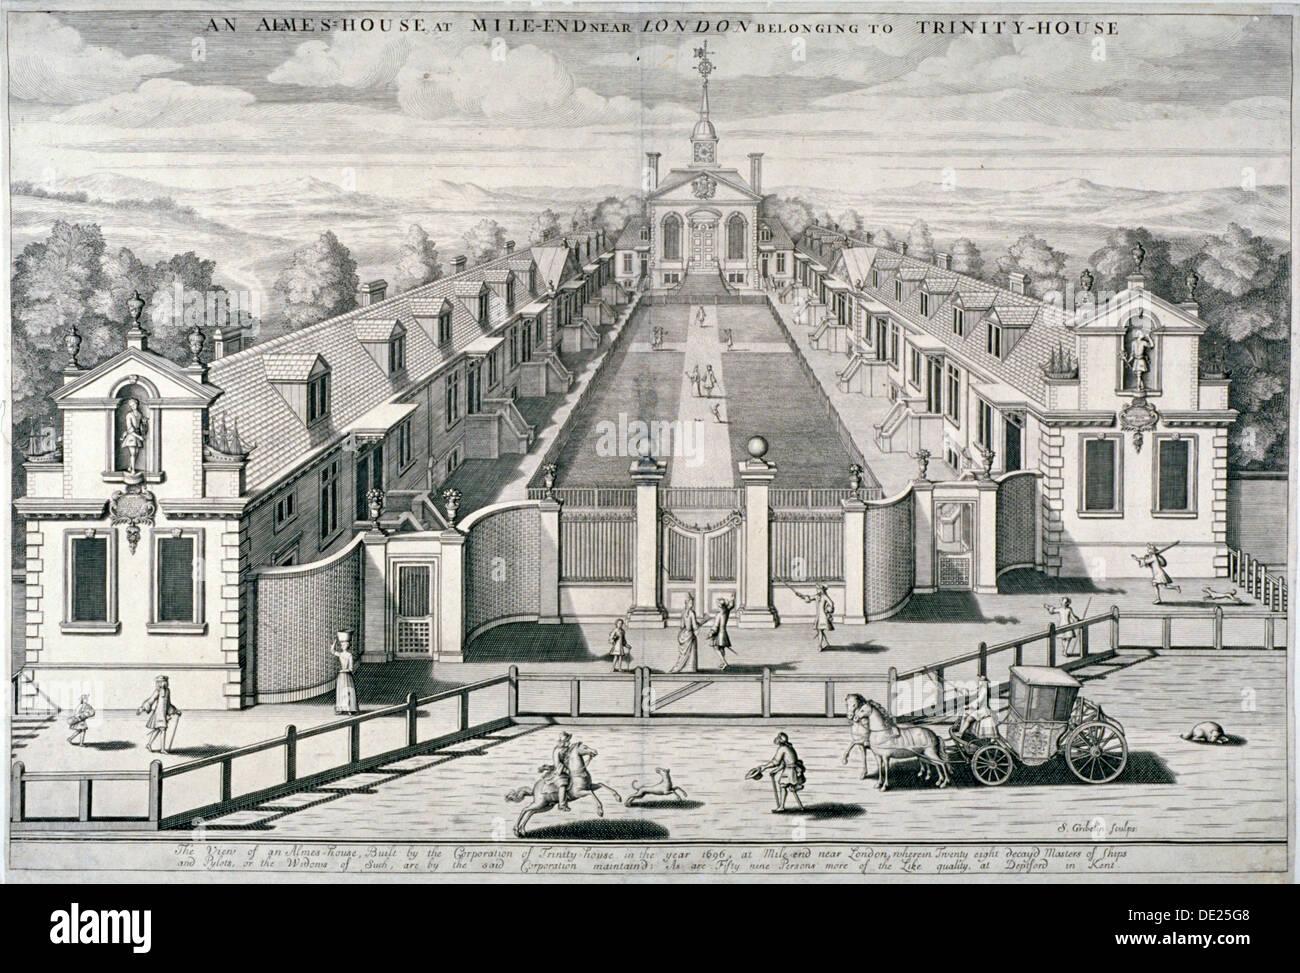 Trinity Almshouses, Mile End Road, Stepney, London, 1696.  Artist: Simon Gribelin Stock Photo